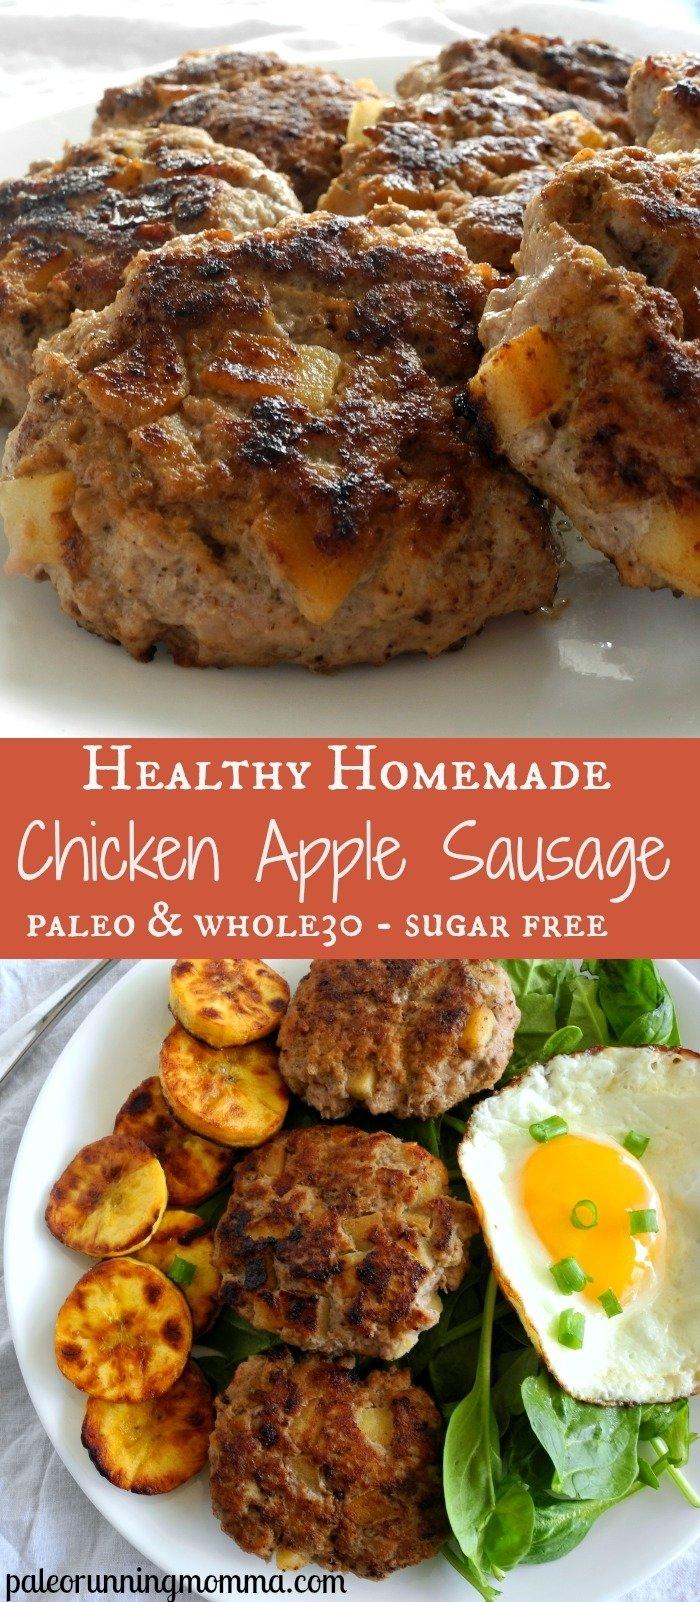 10 Stylish Chicken Apple Sausage Recipe Ideas easy homemade chicken apple sausage paleo whole30